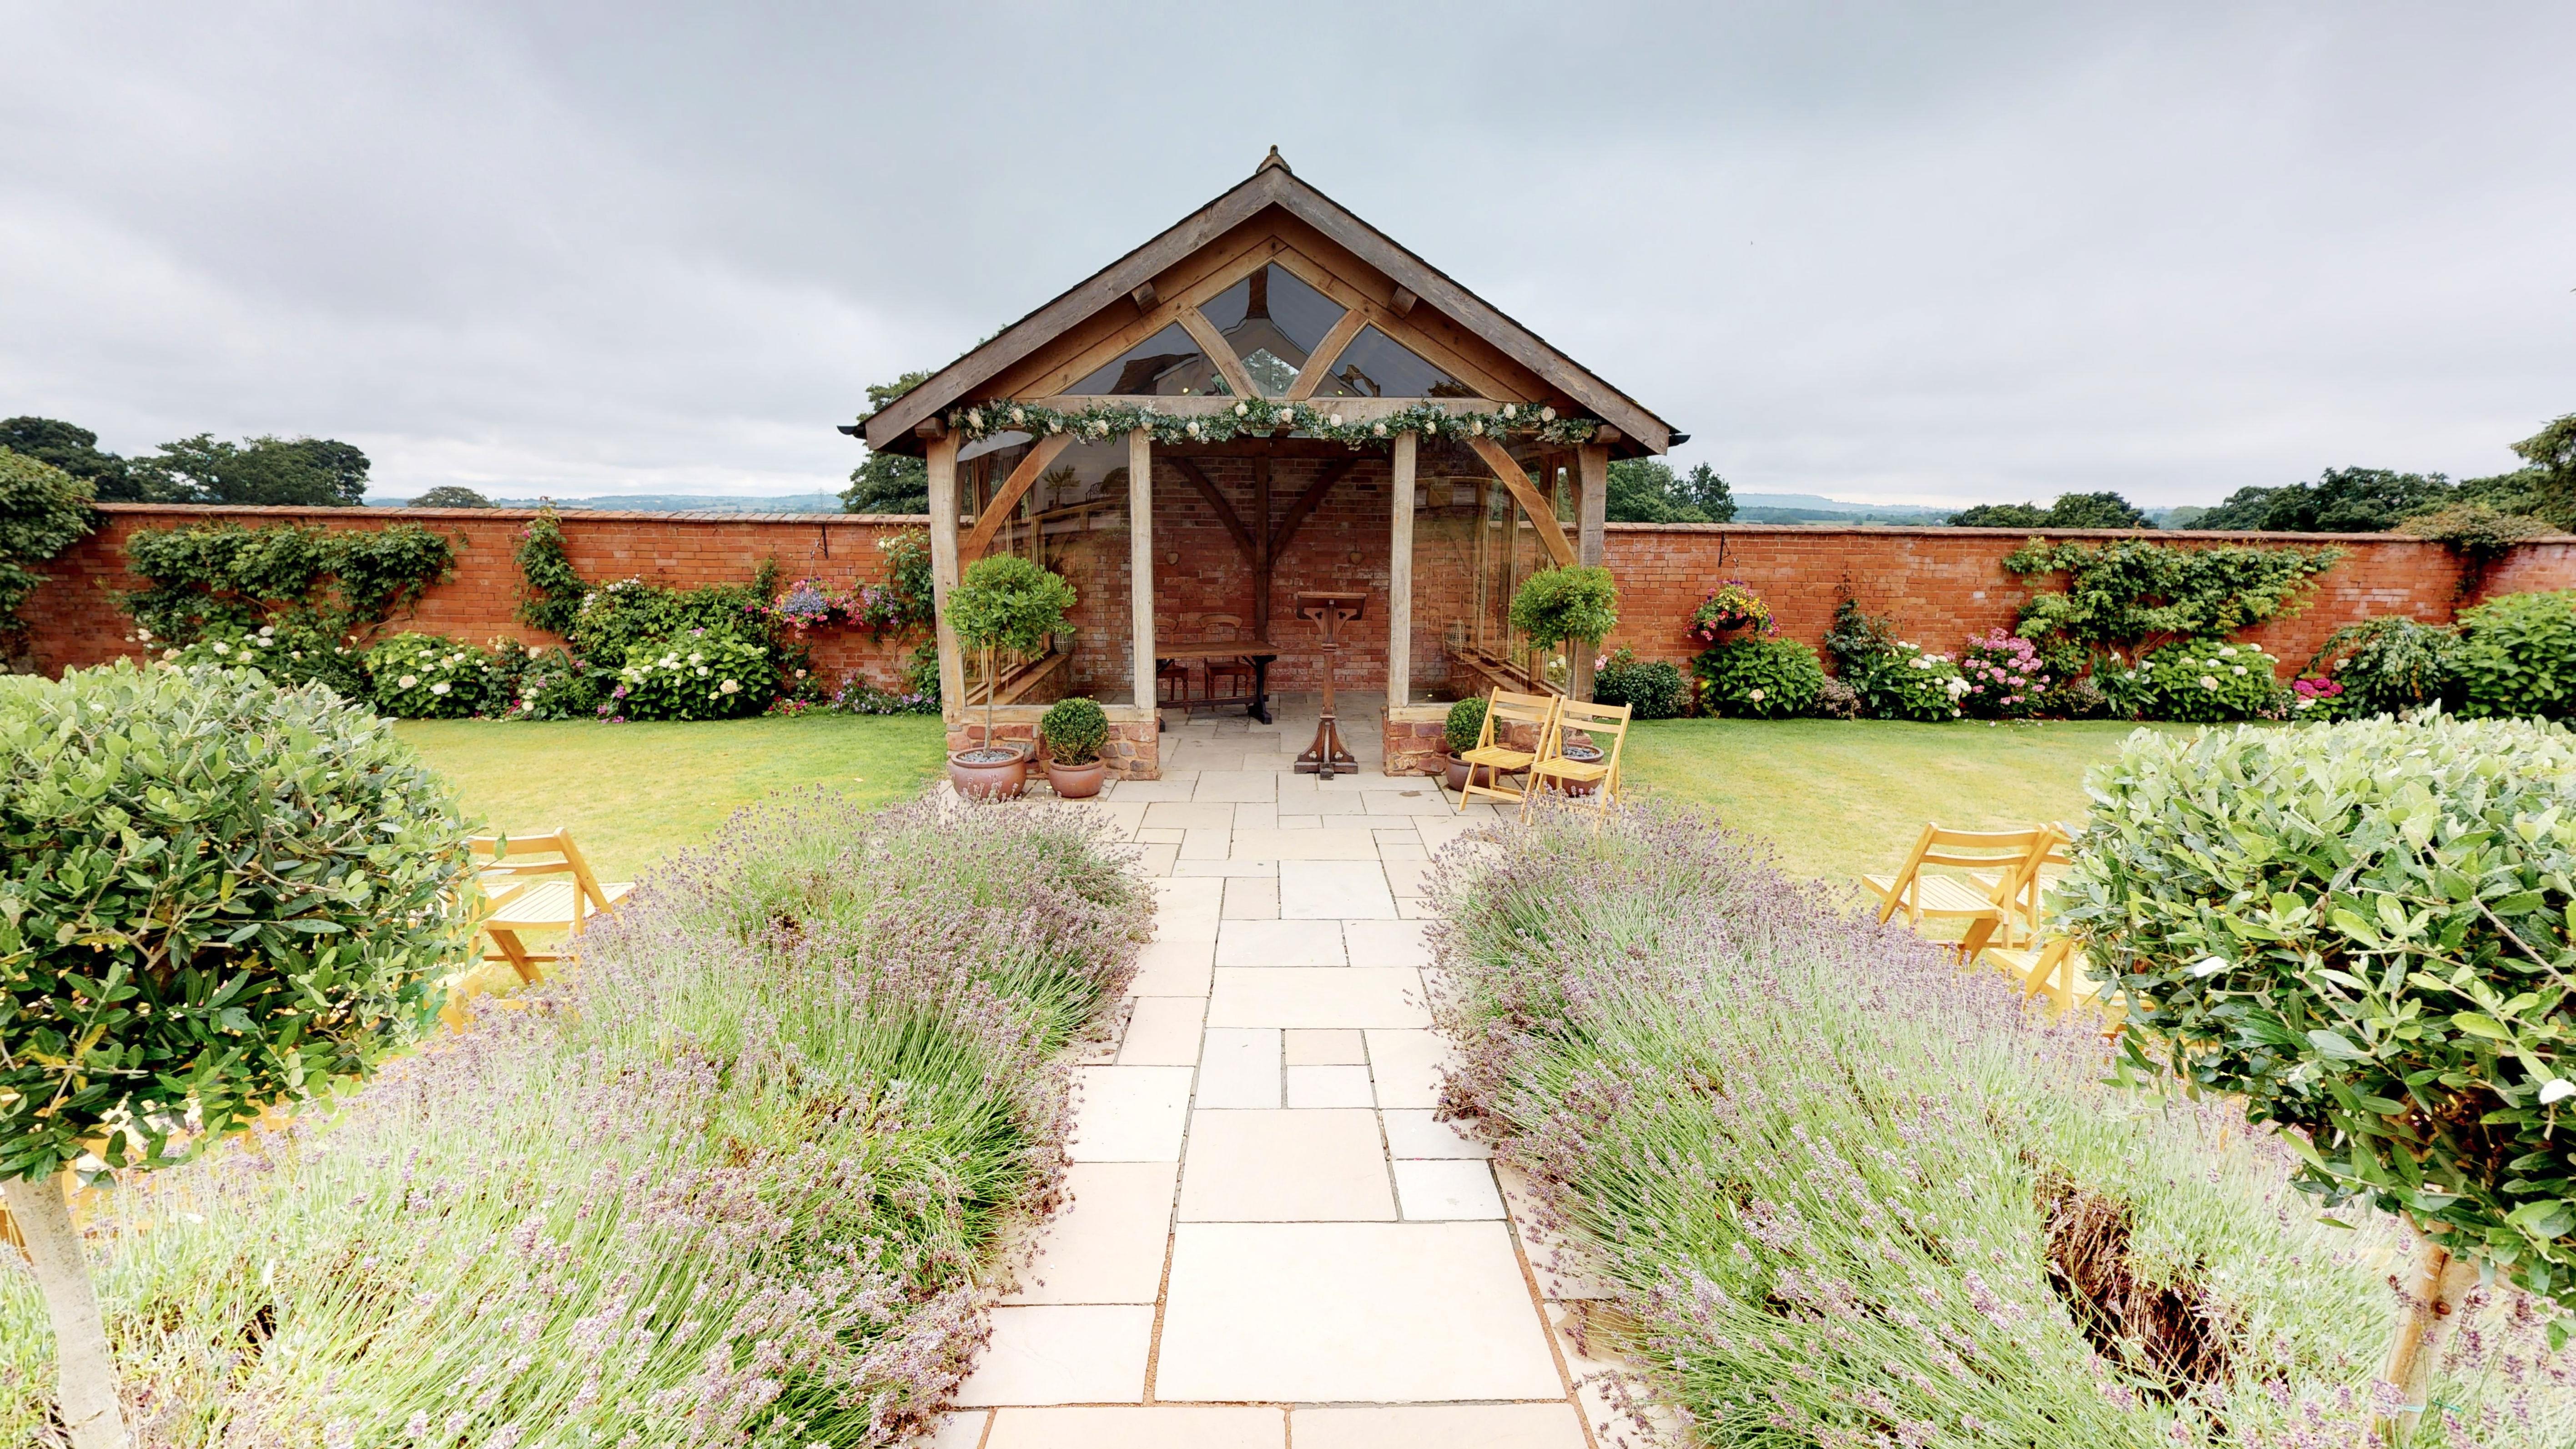 The Walled Garden Arbour